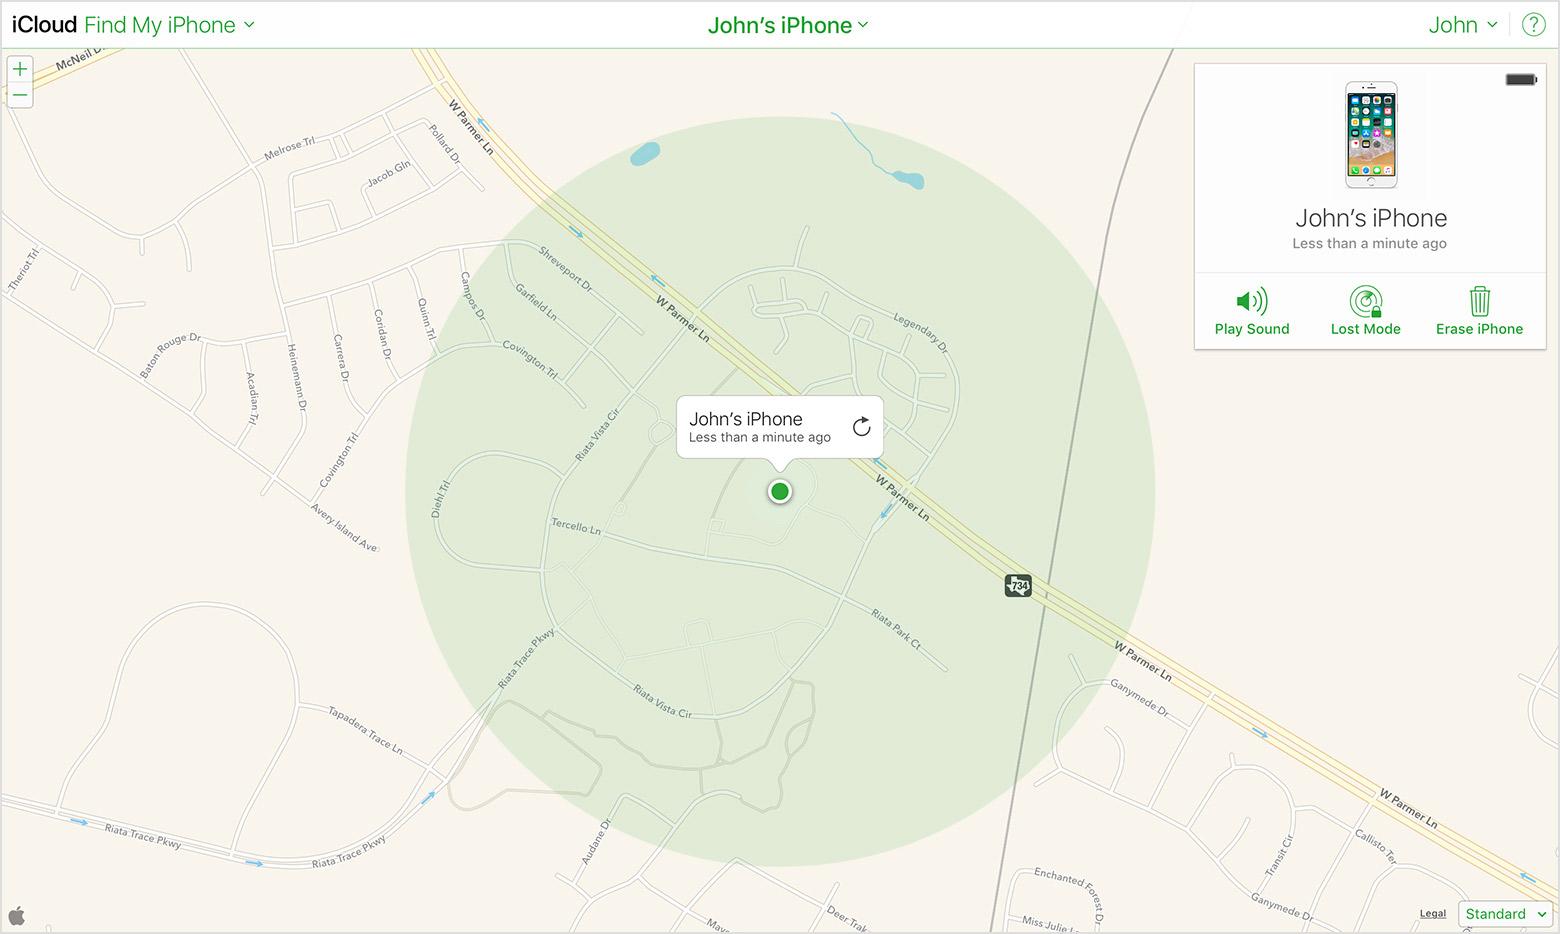 [Resim: macos-safari-icloud-find-my-iphone-ios11...circle.jpg]